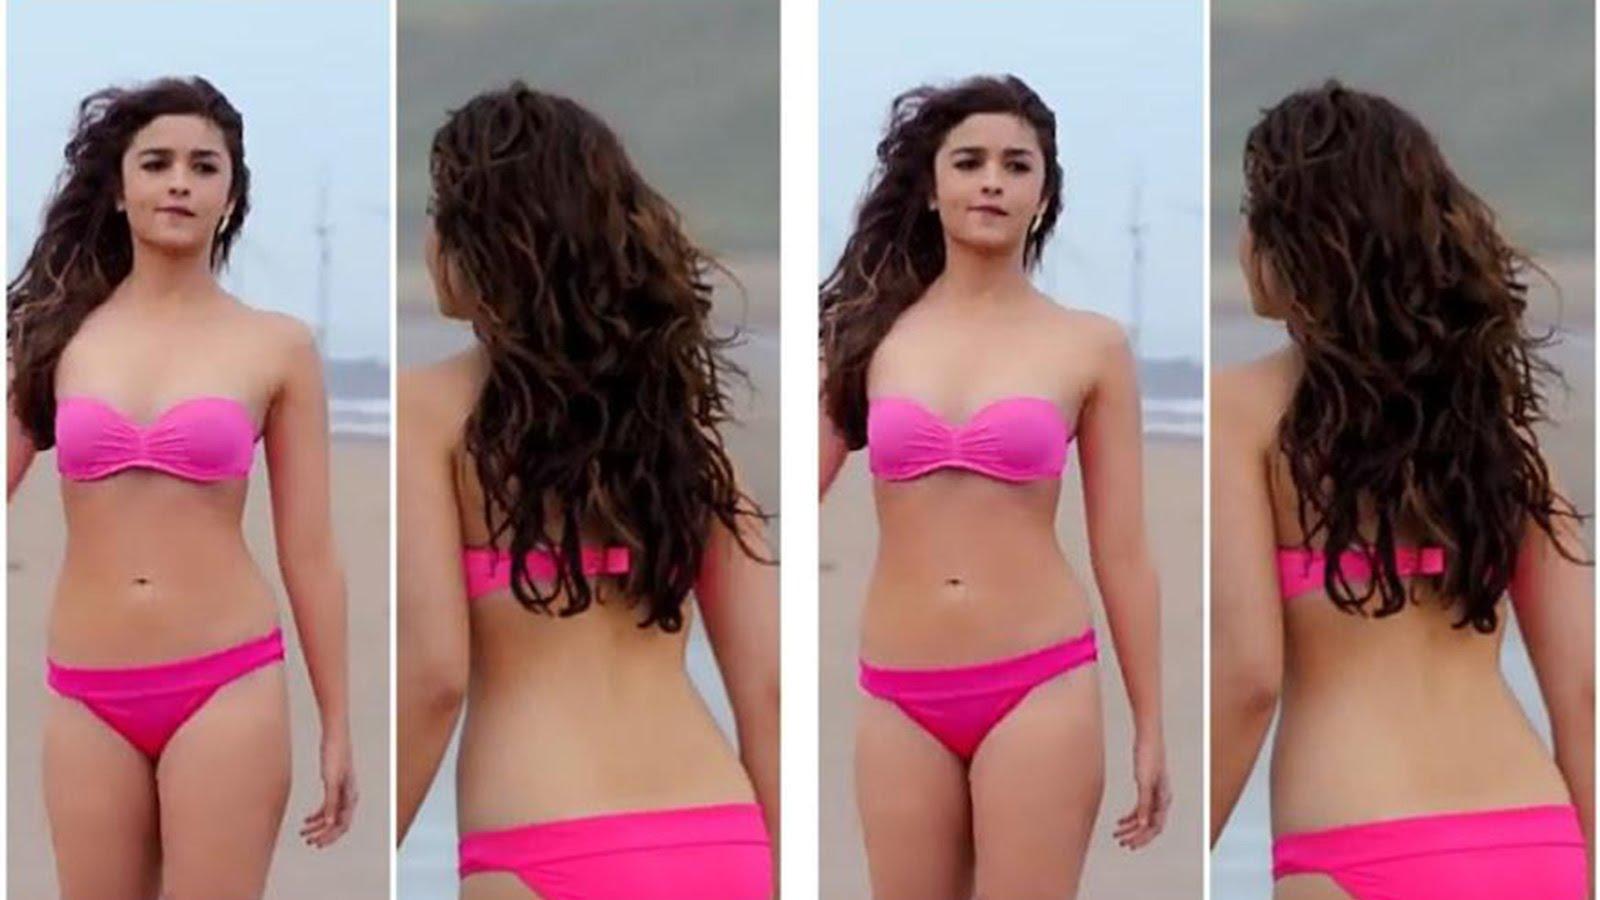 alia bhatt sizzles in pink bikini in shaandaar video - cine fires